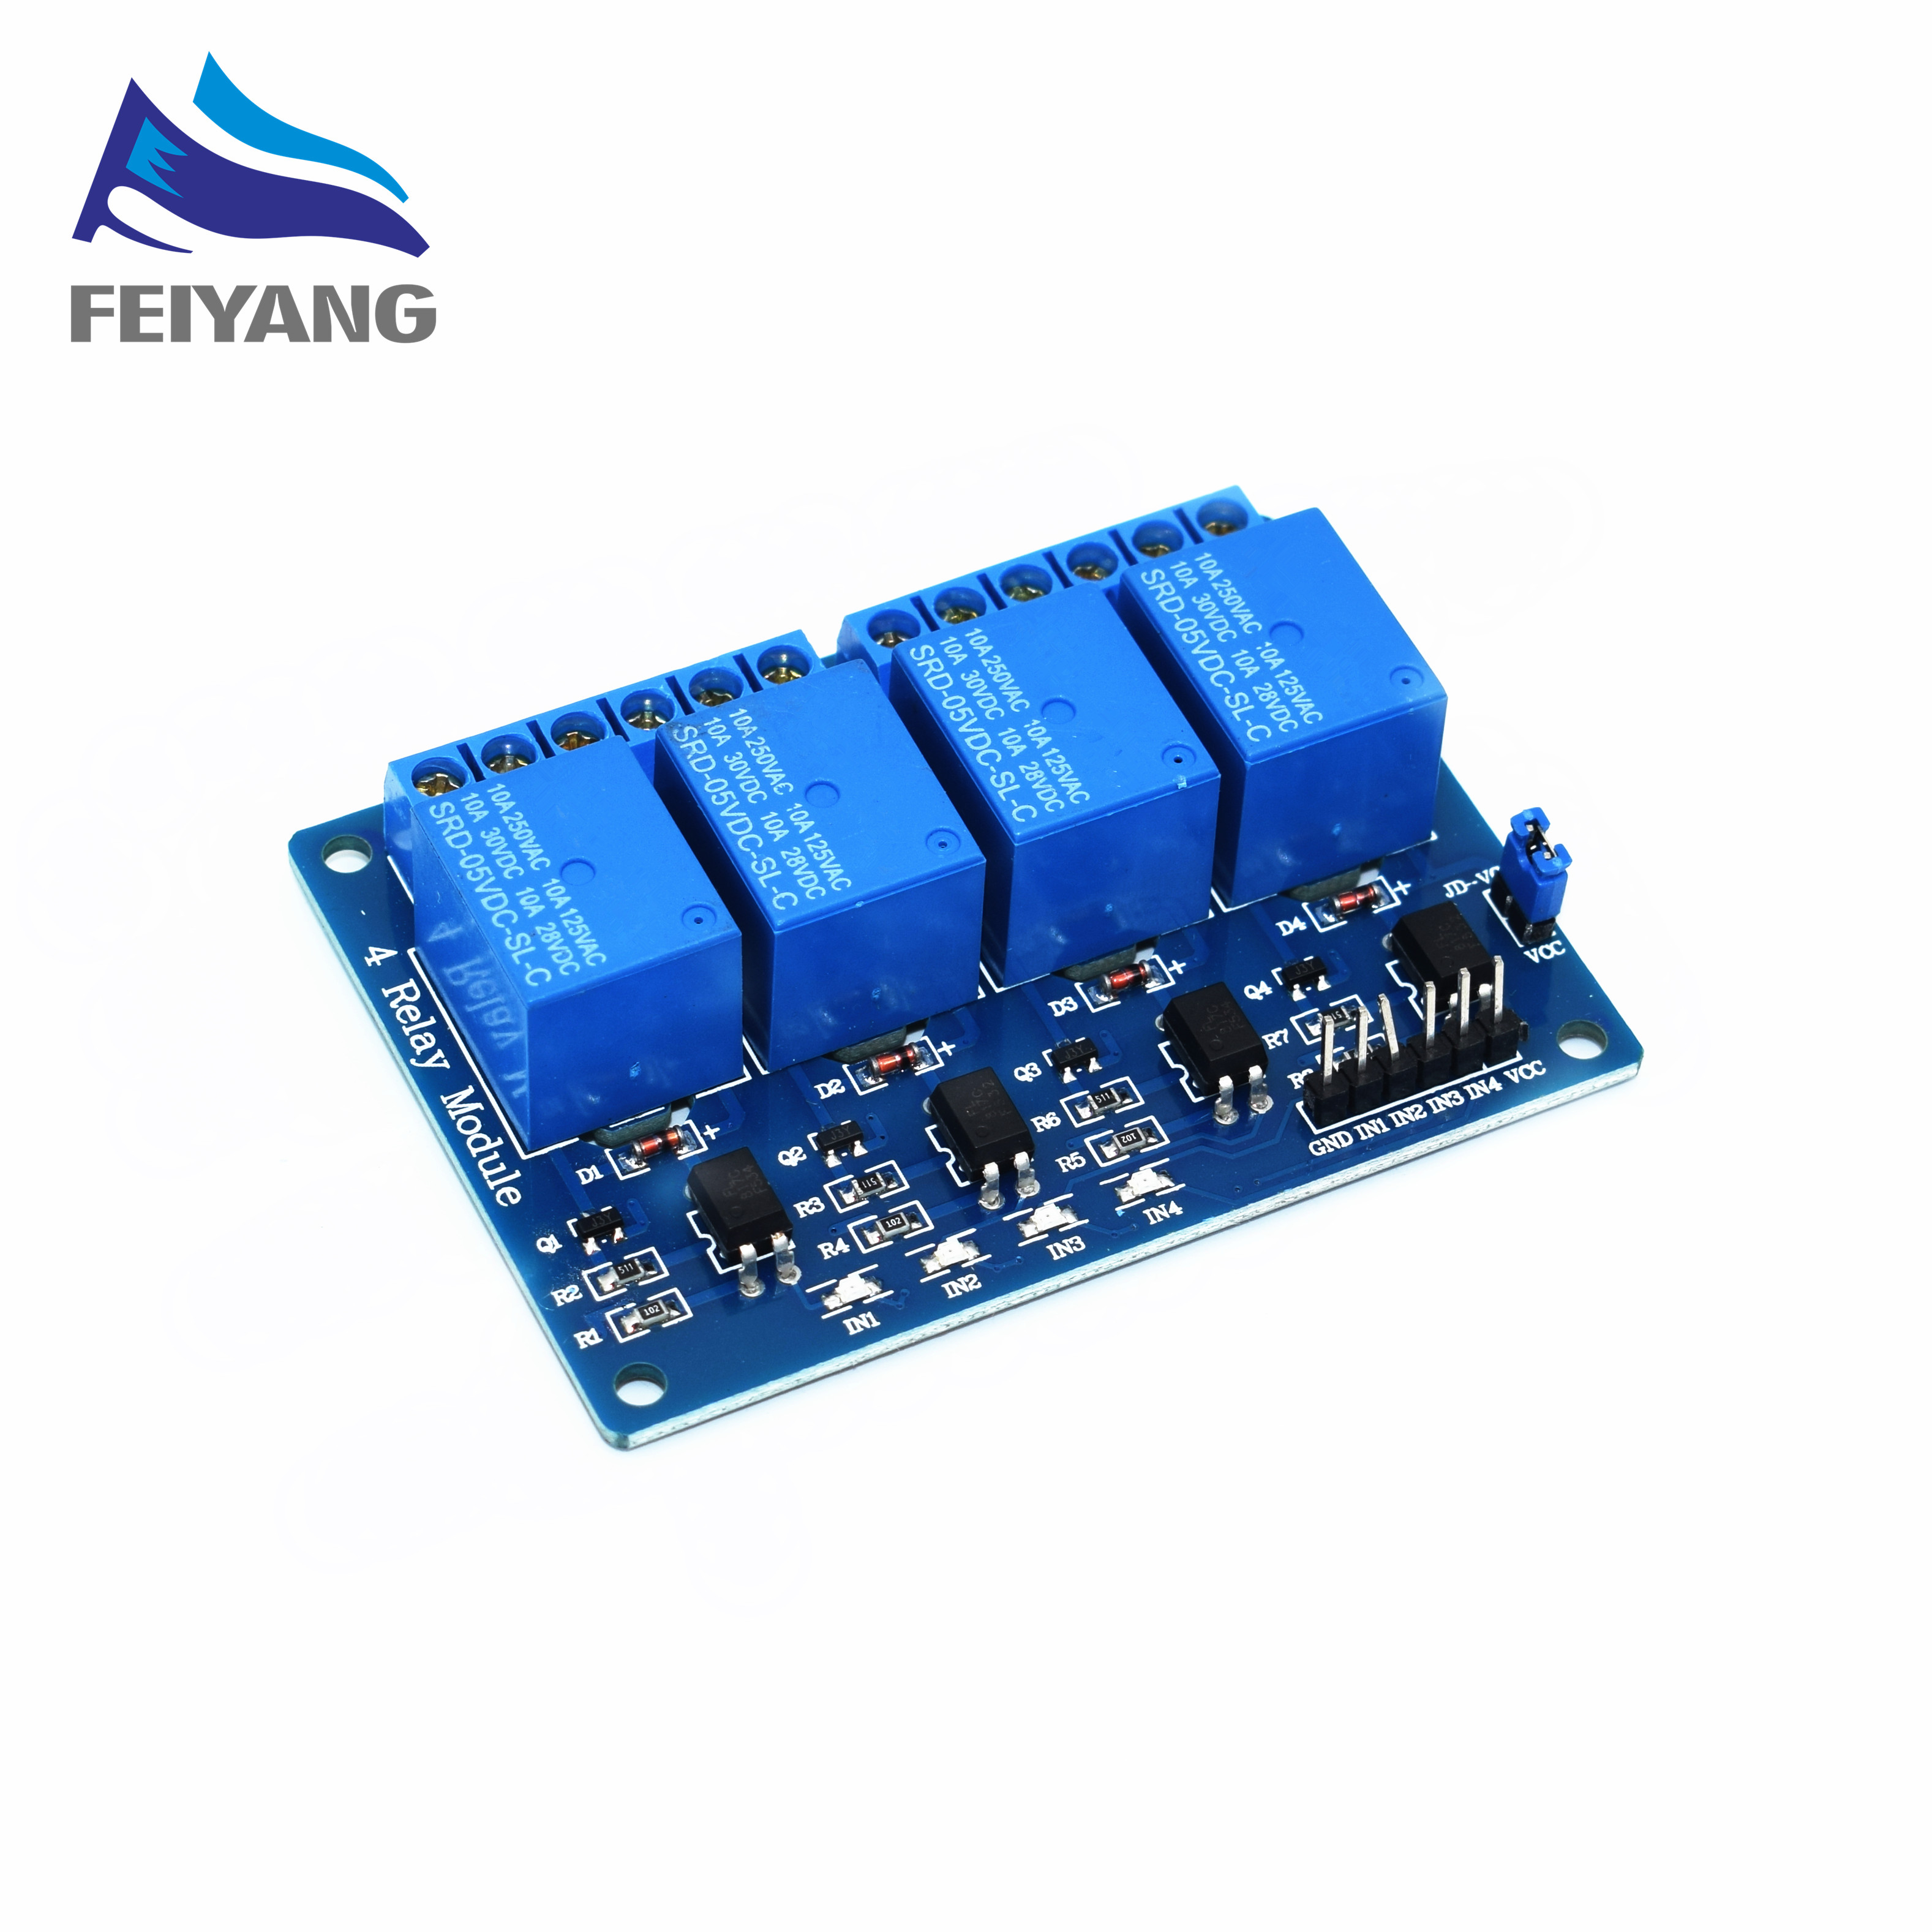 10PCS SAMIORE ROBOT 5V 4-Channel Relay Module Shield ARM PICs